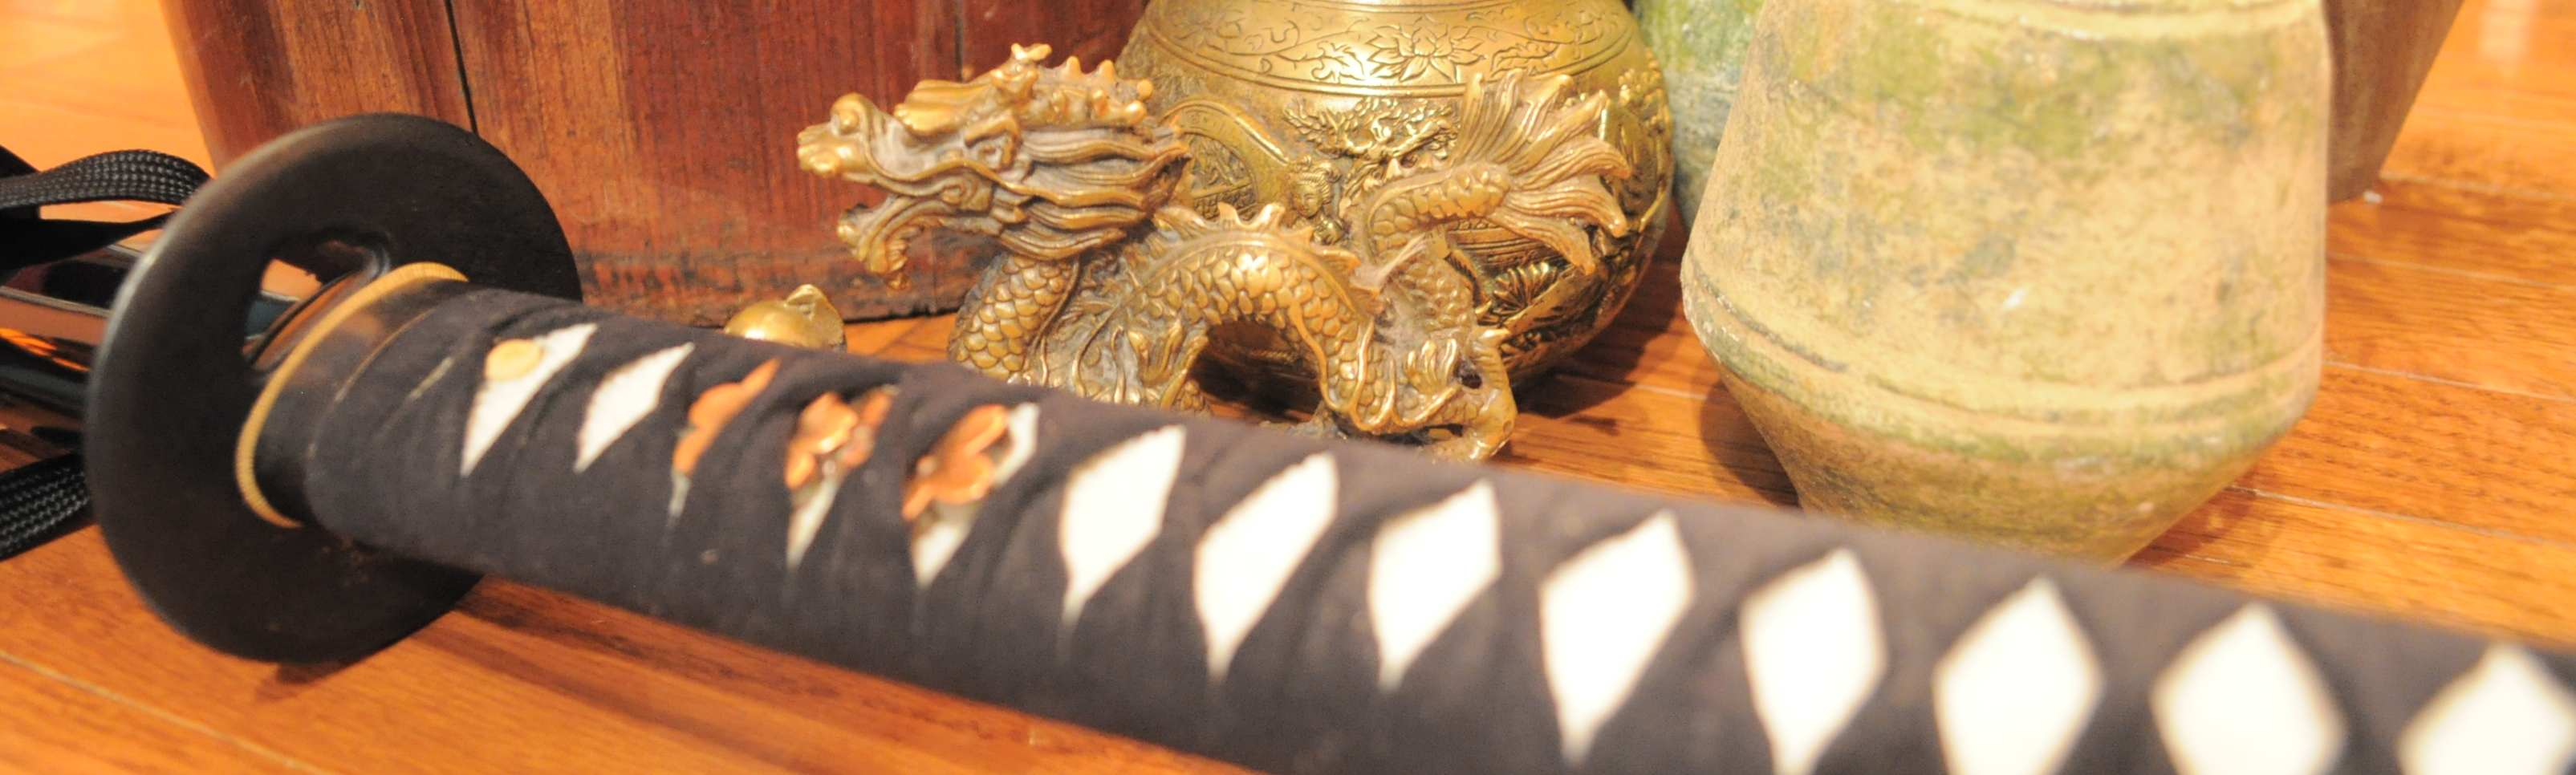 Aikido is Katsujinken.